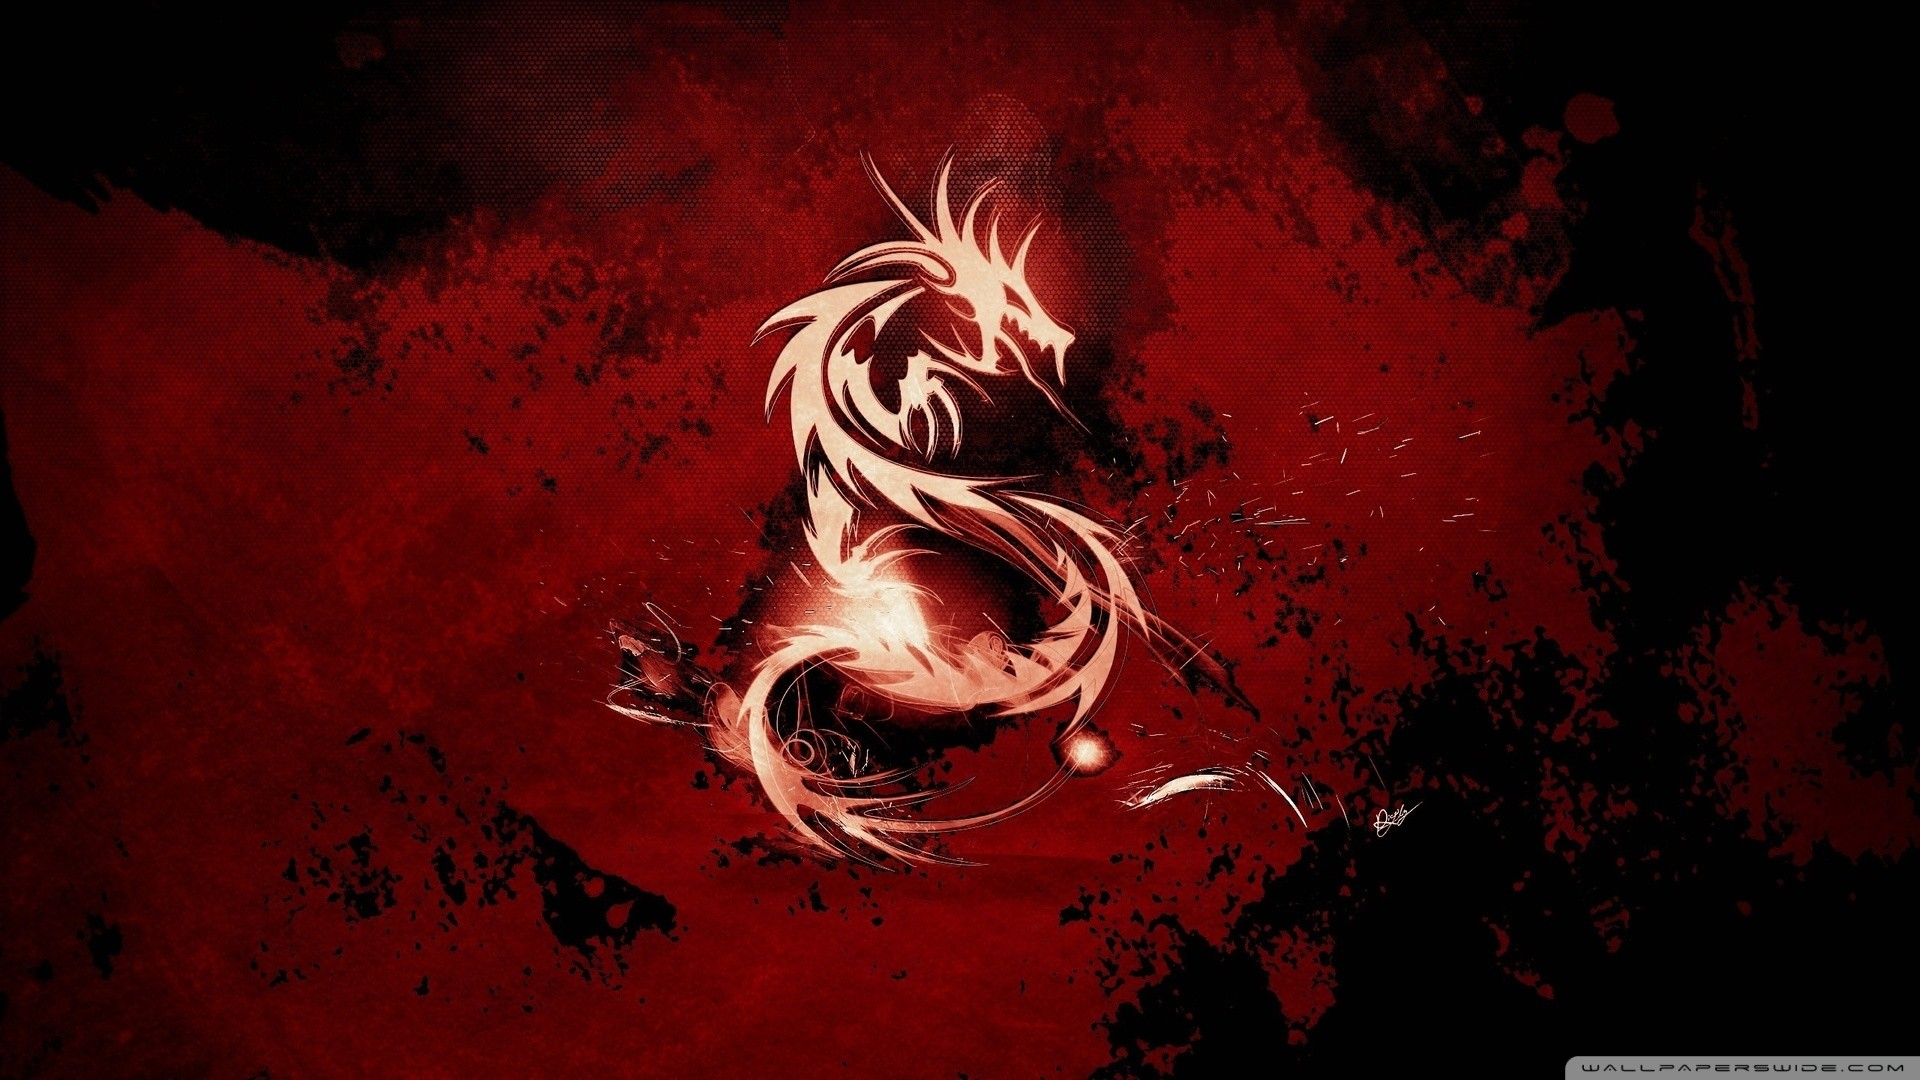 Blood Red Dragon Wallpaper Blood, Red, Dragon